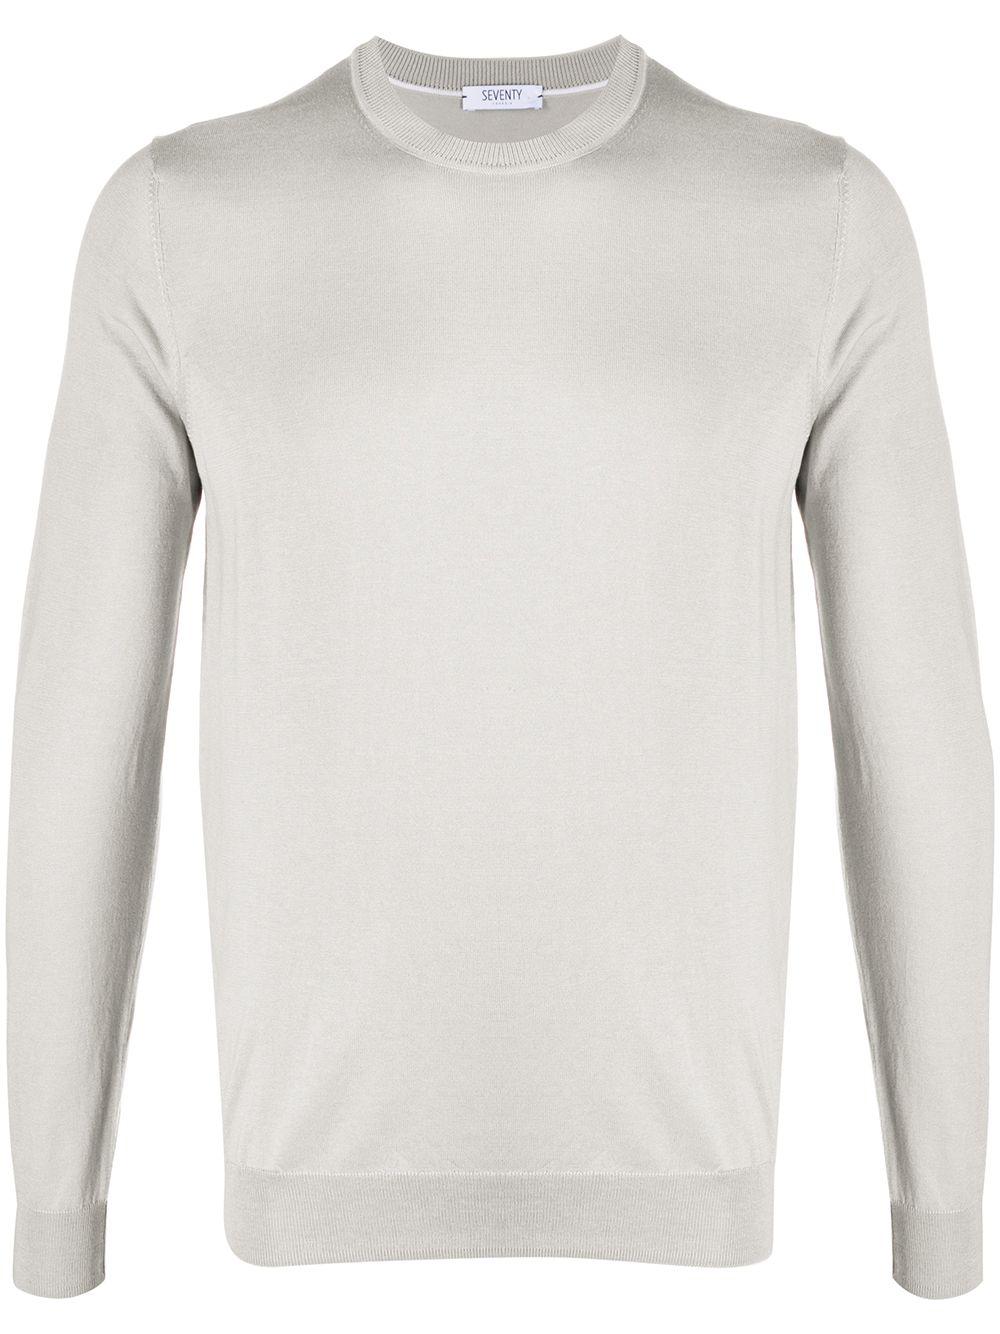 Silk Blenc Crewneck Sweater